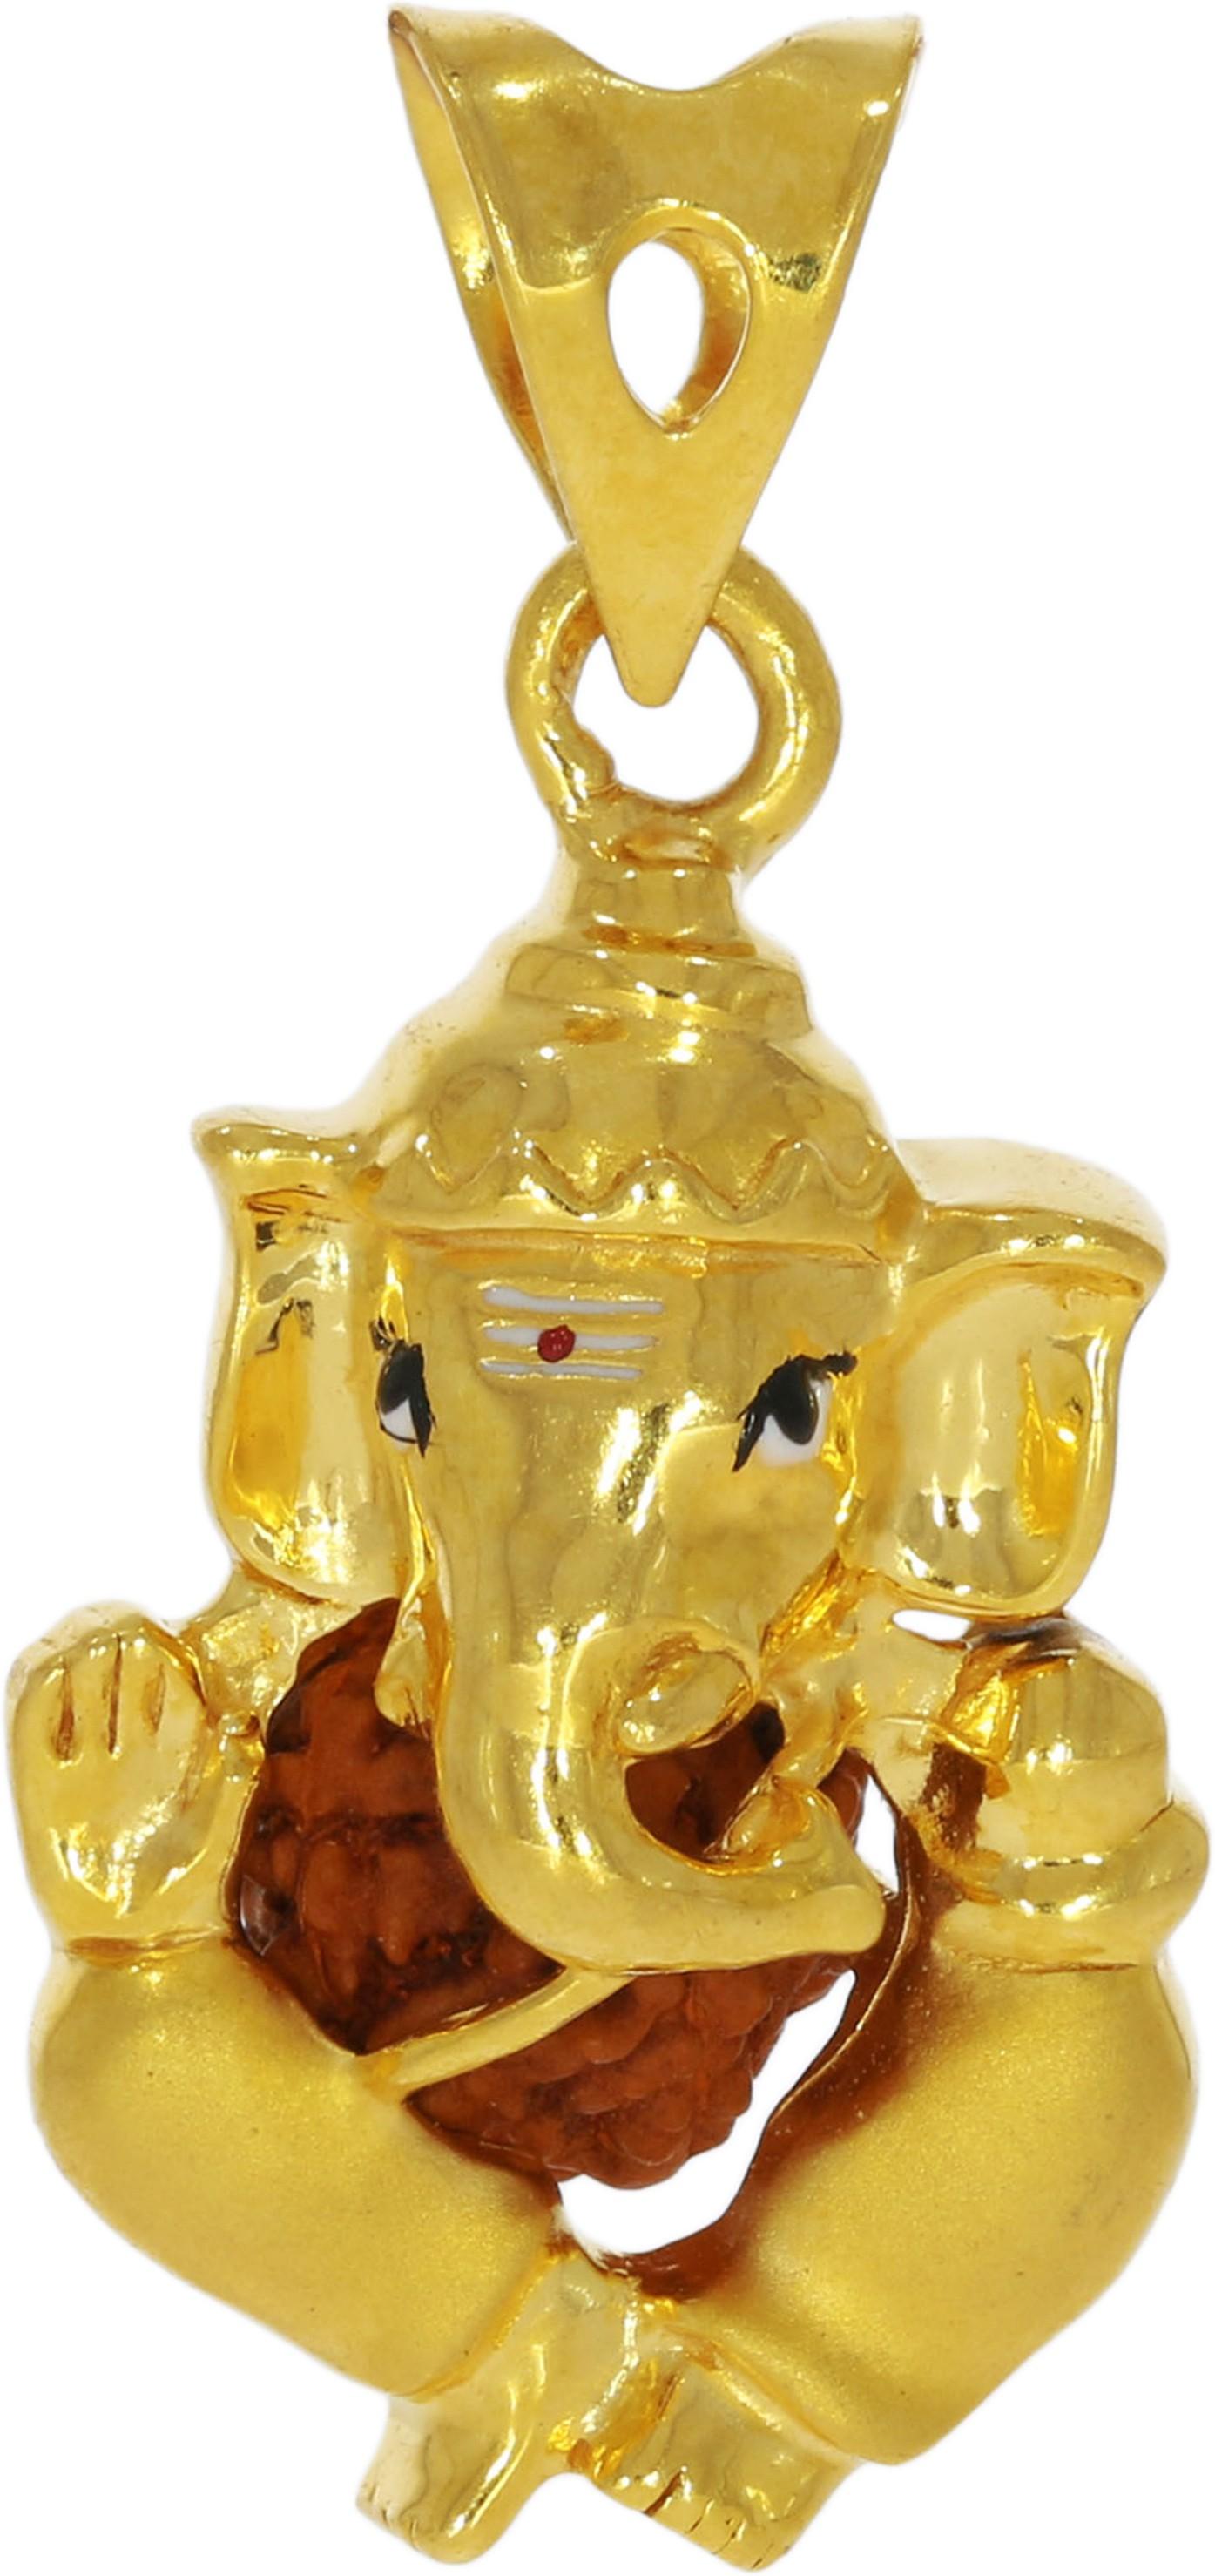 Deals - Delhi - Earrings, Rings... <br> C. Krishniah Chetty Jewellers<br> Category - jewellery<br> Business - Flipkart.com